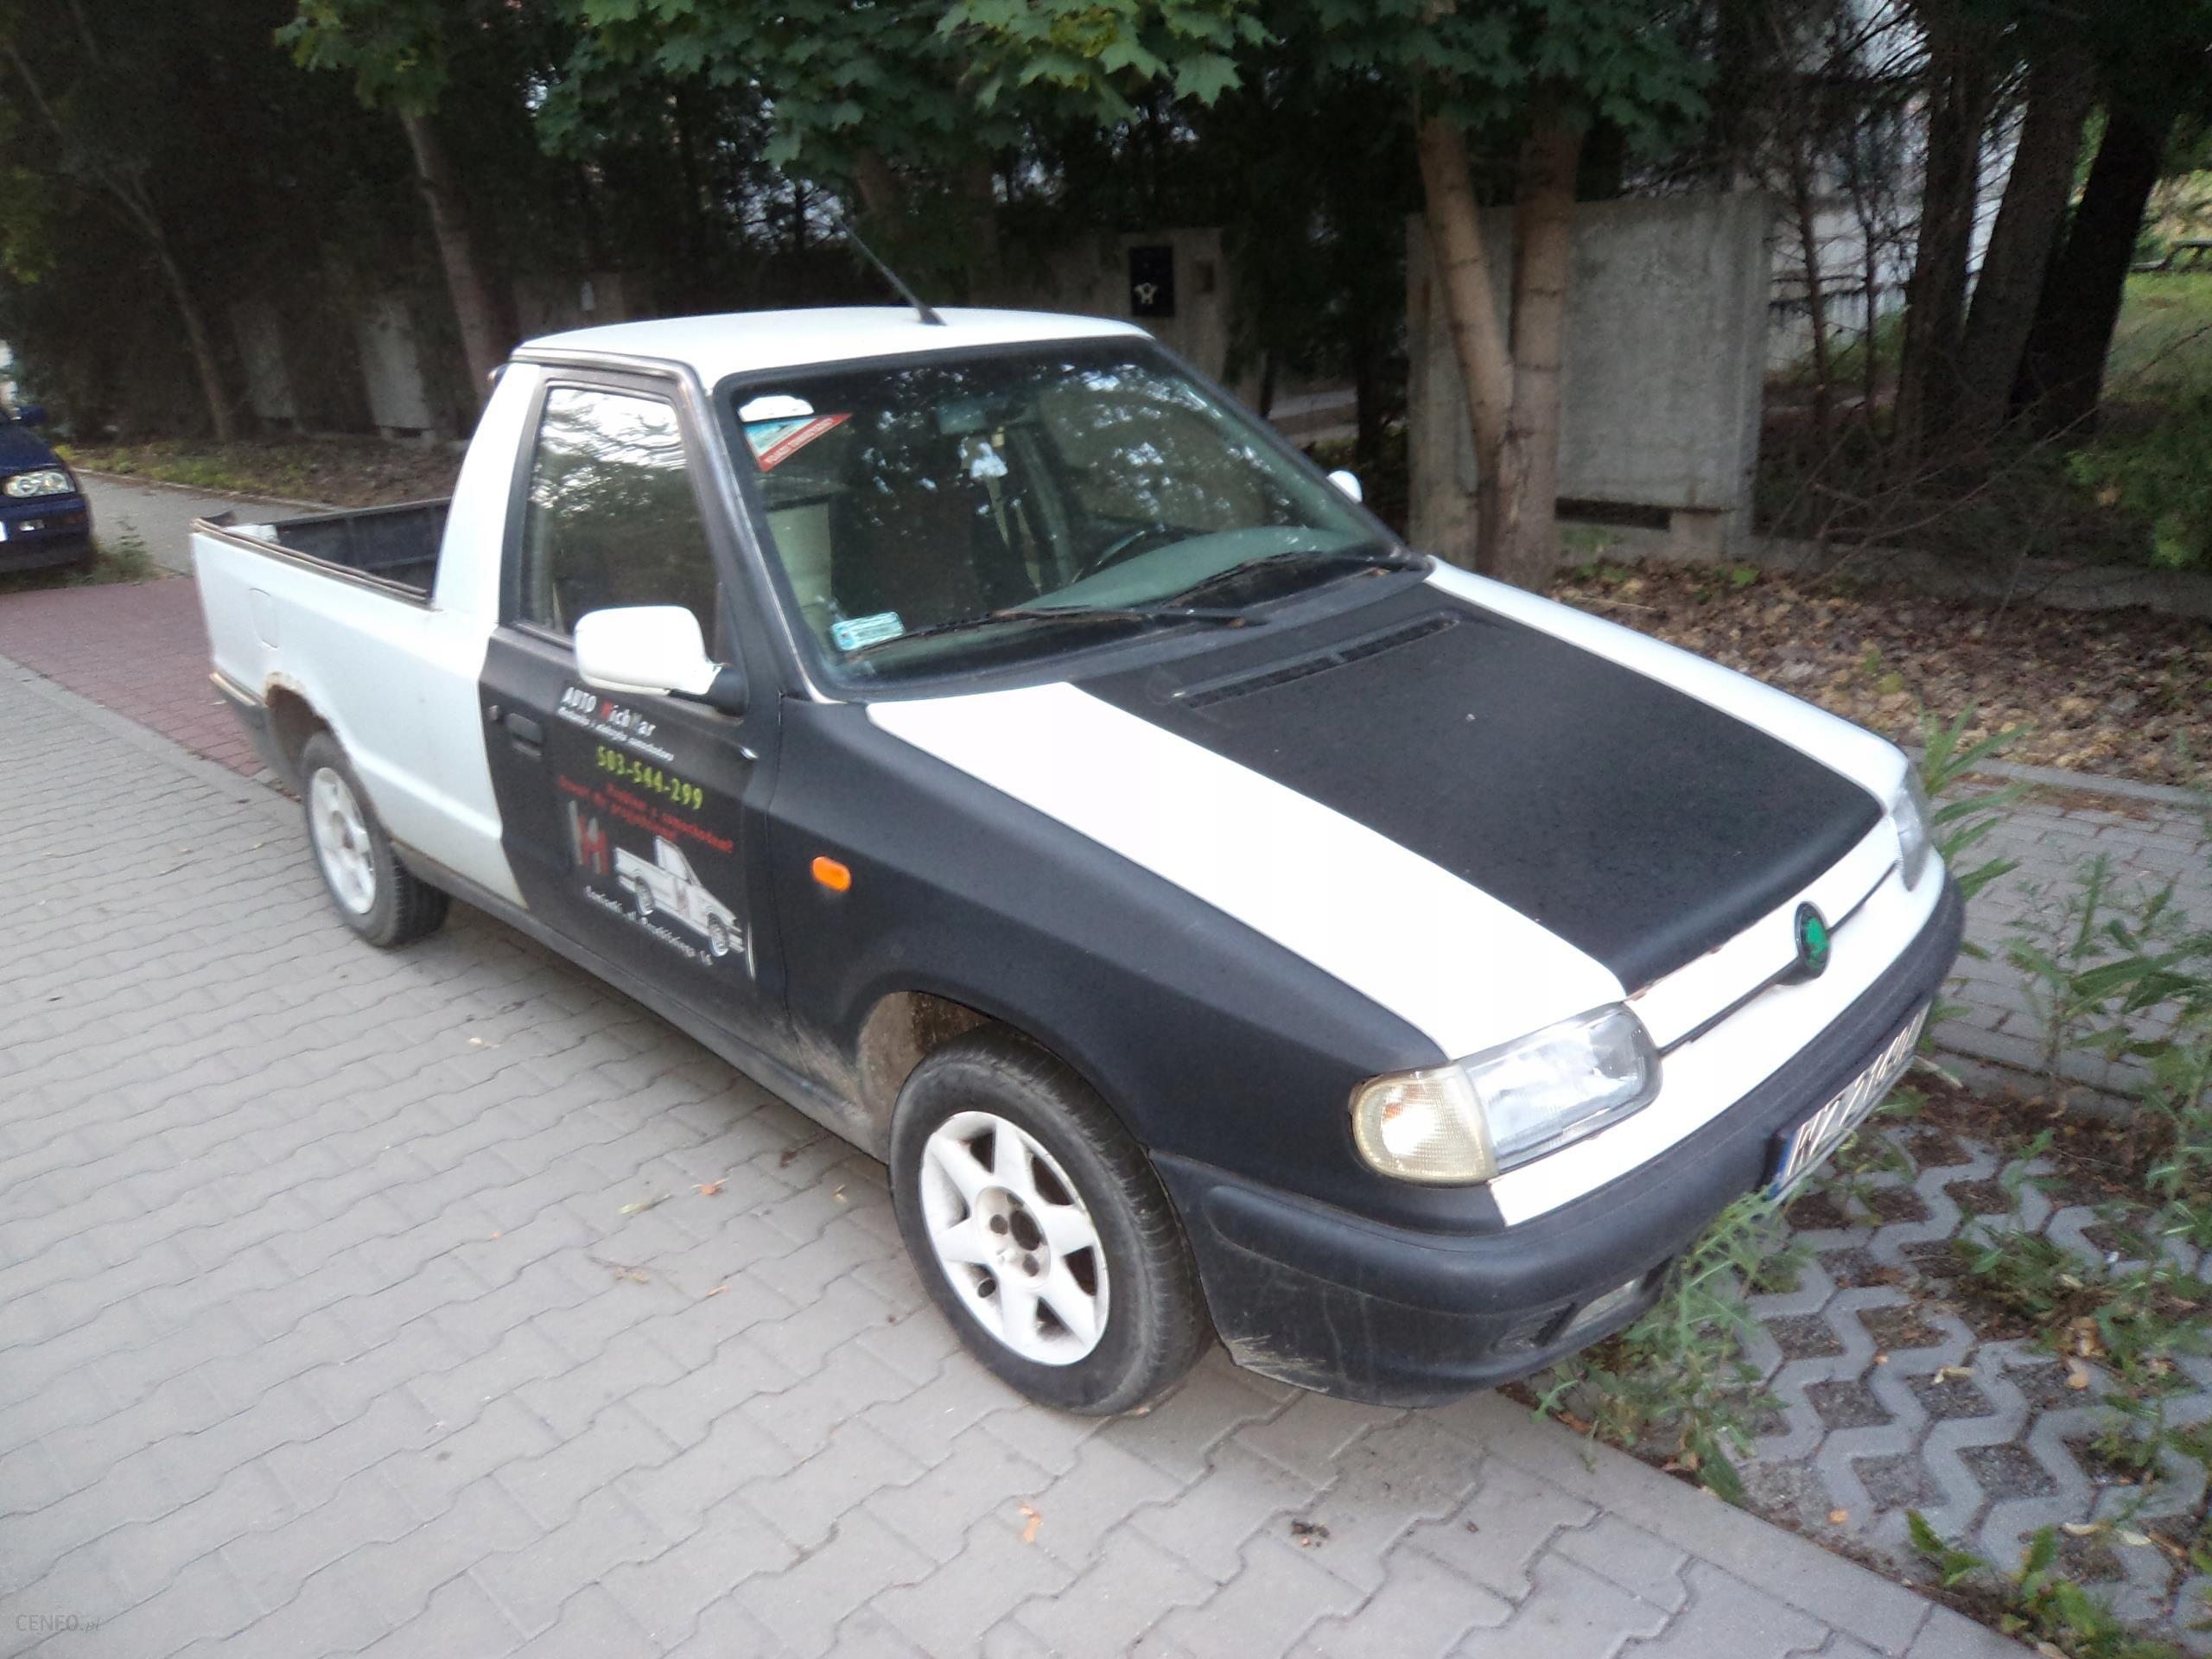 Zabudowa Paki Skoda Felicia Pickup Fvat Gubin Allegro Pl